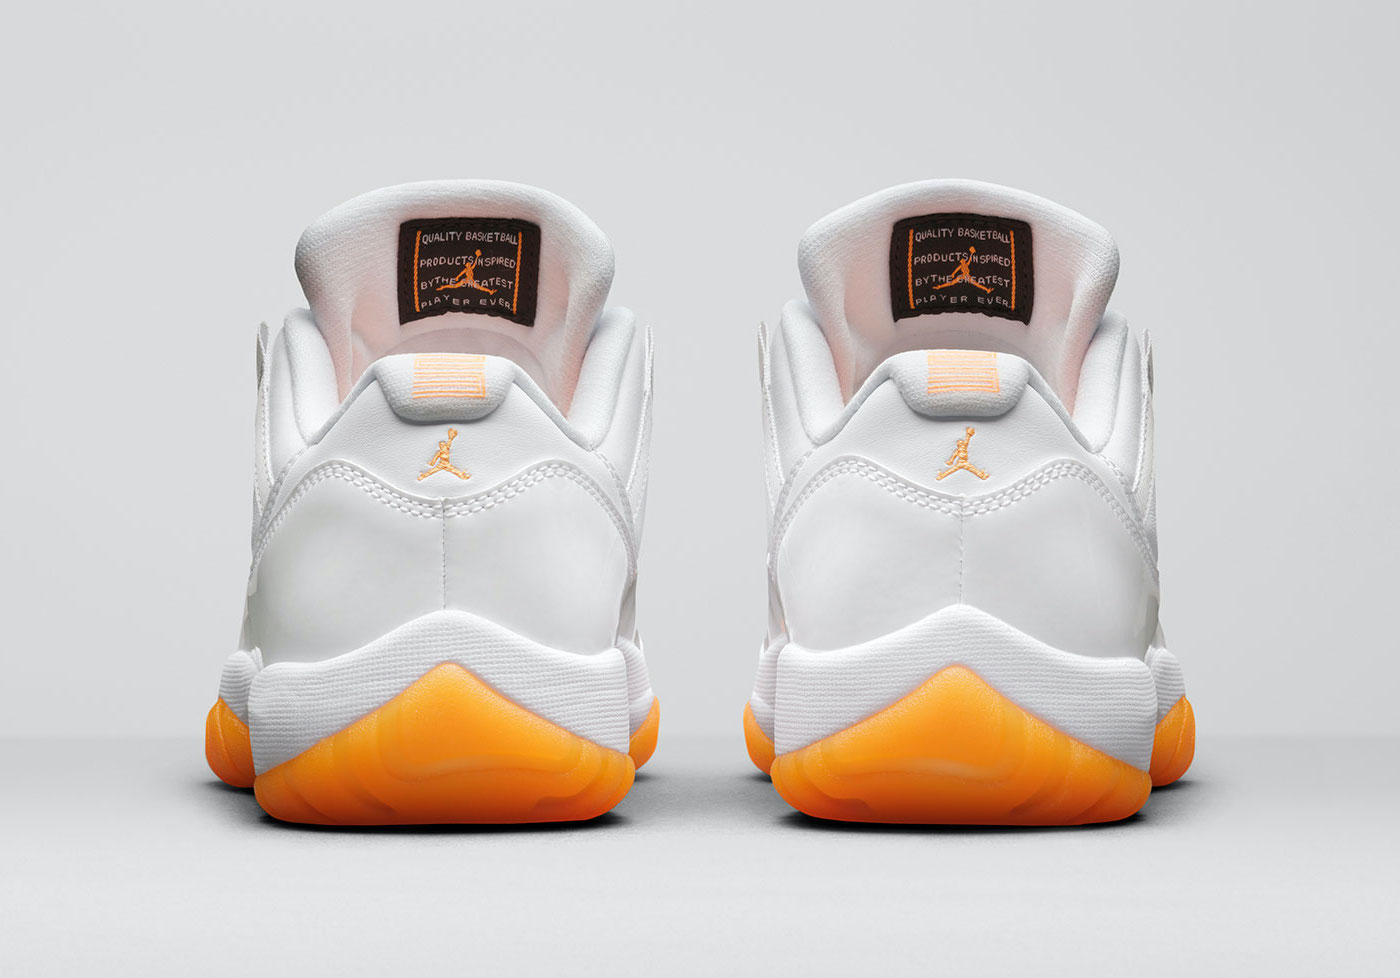 Air-Jordan-11-Low-Bright-Citrus-AH7860-139-1